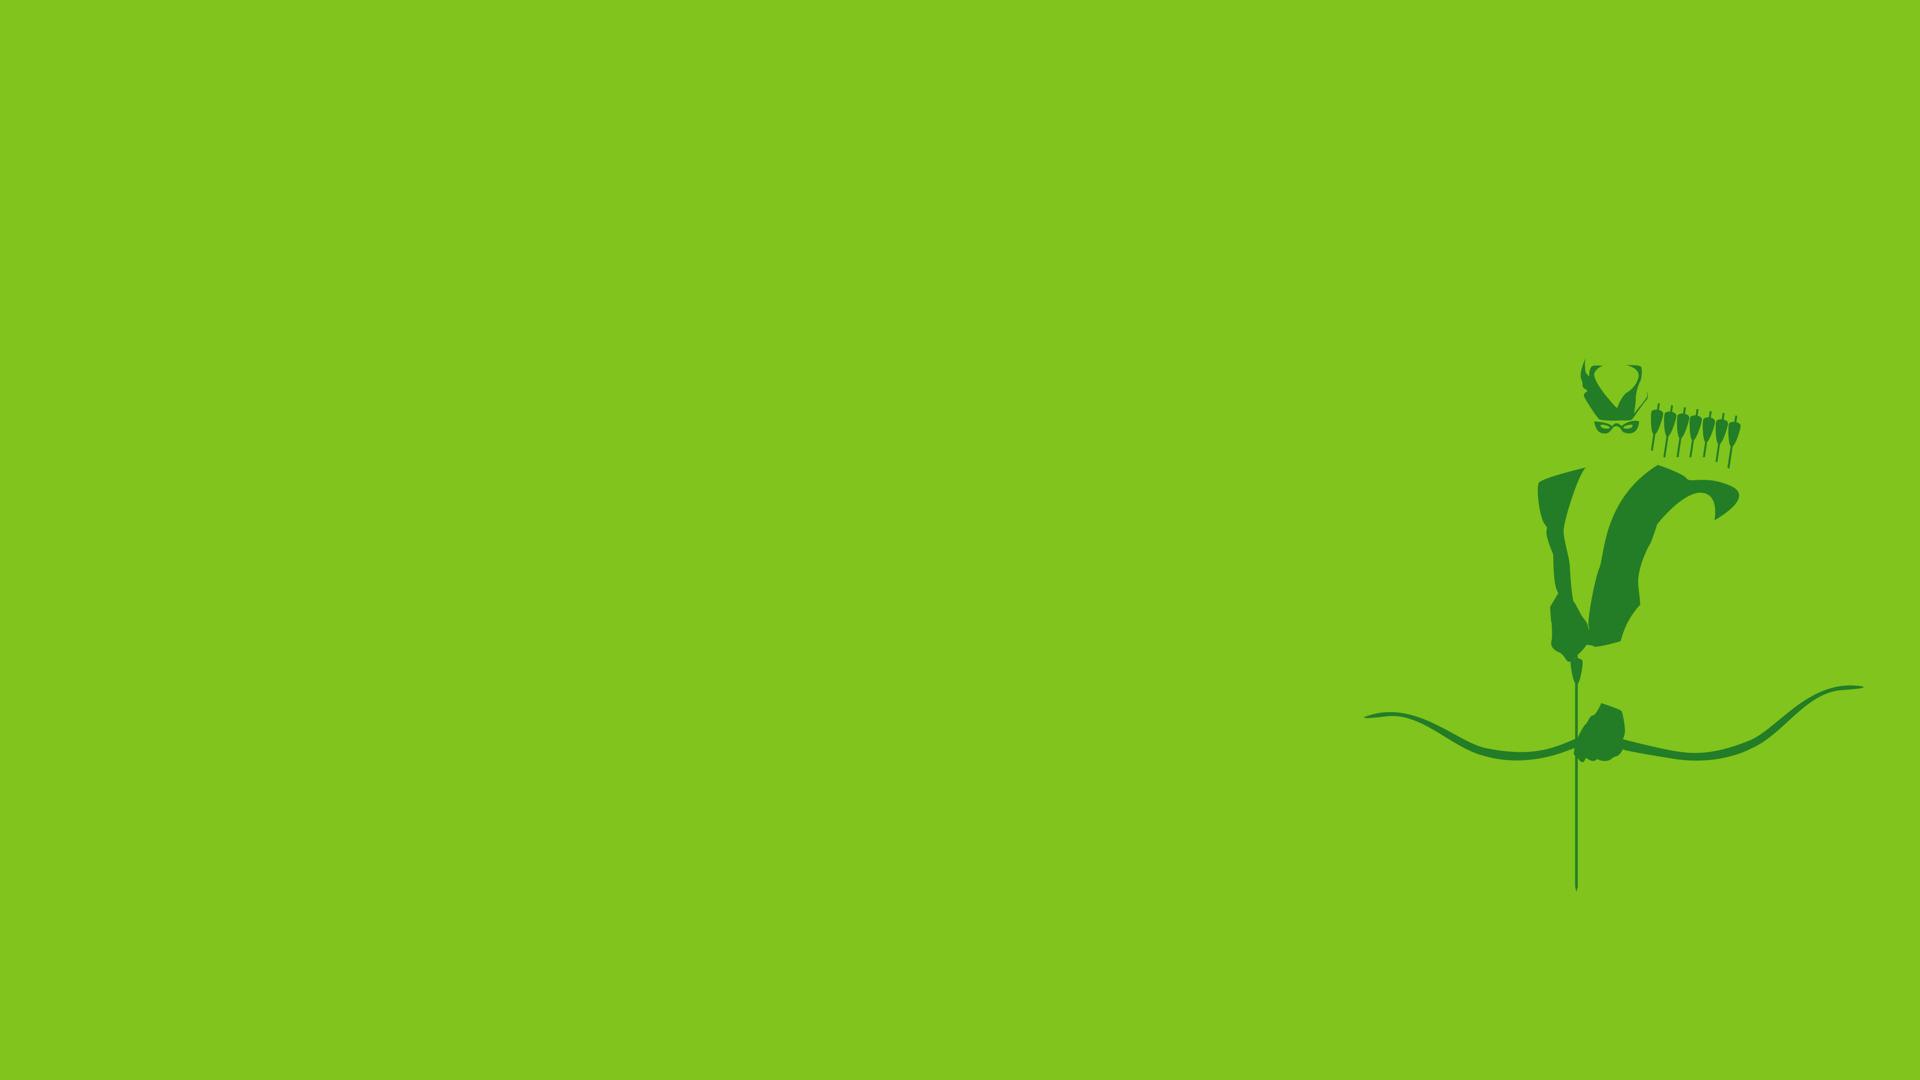 Green Arrow HD Wallpaper | Background Image | 1920x1080 | ID:443638 - Wallpaper Abyss